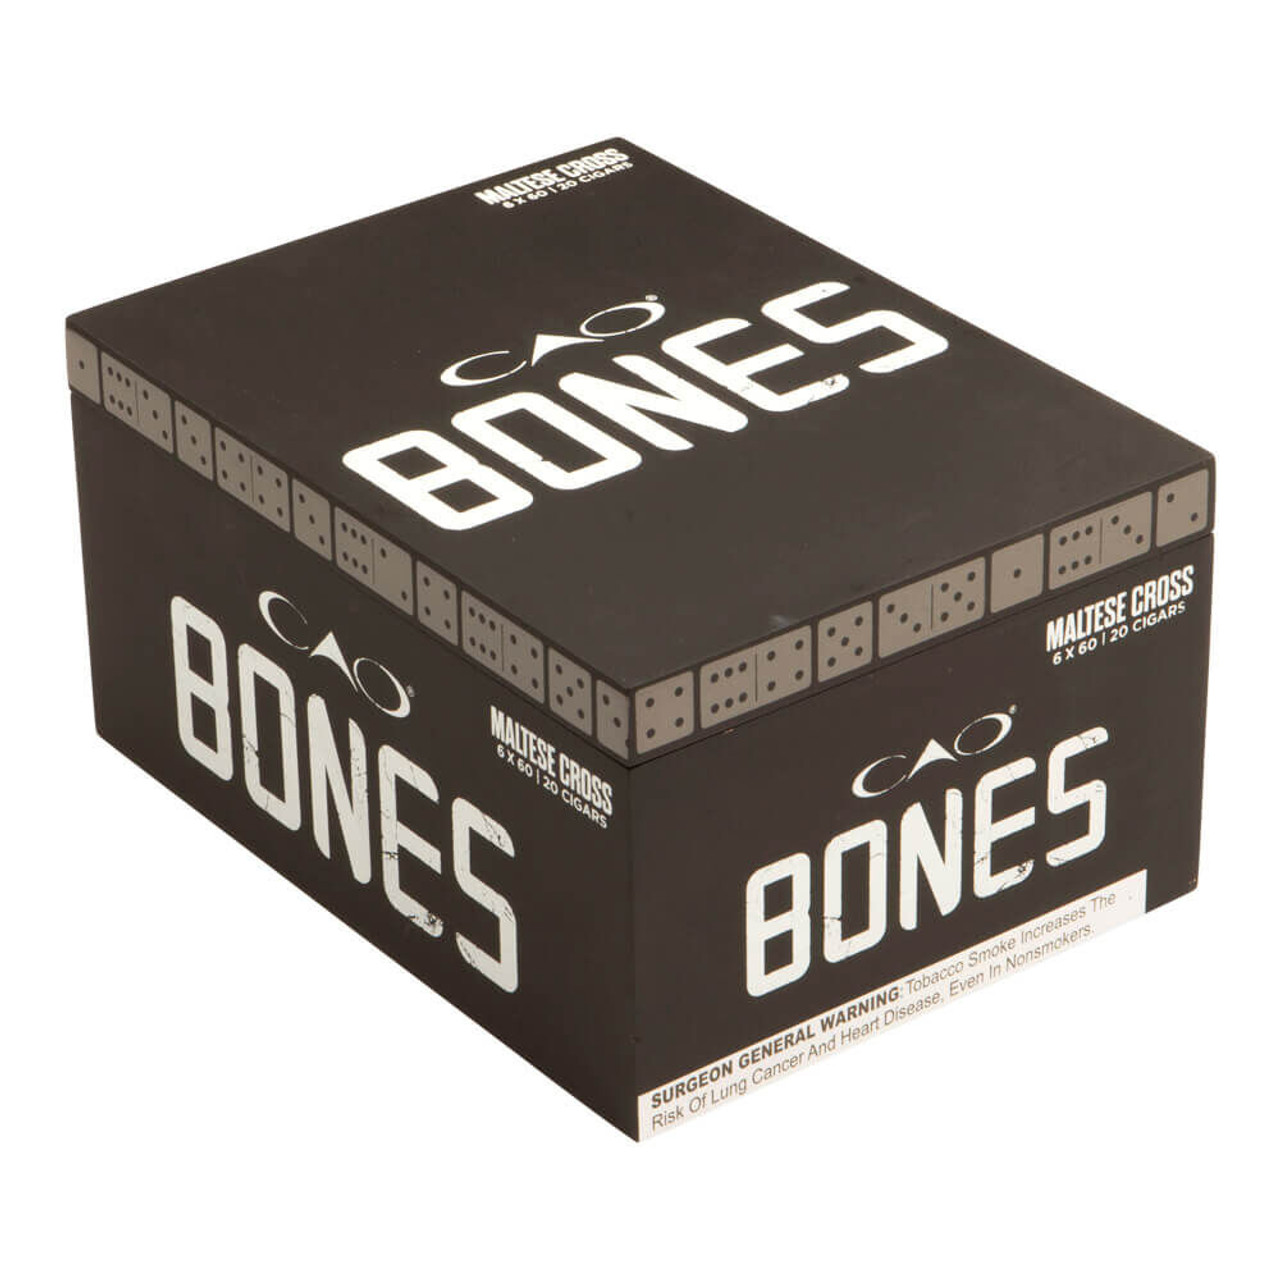 CAO Bones Maltese Cross Gigante  Cigars - 6.0 x 60 (Box of 20)